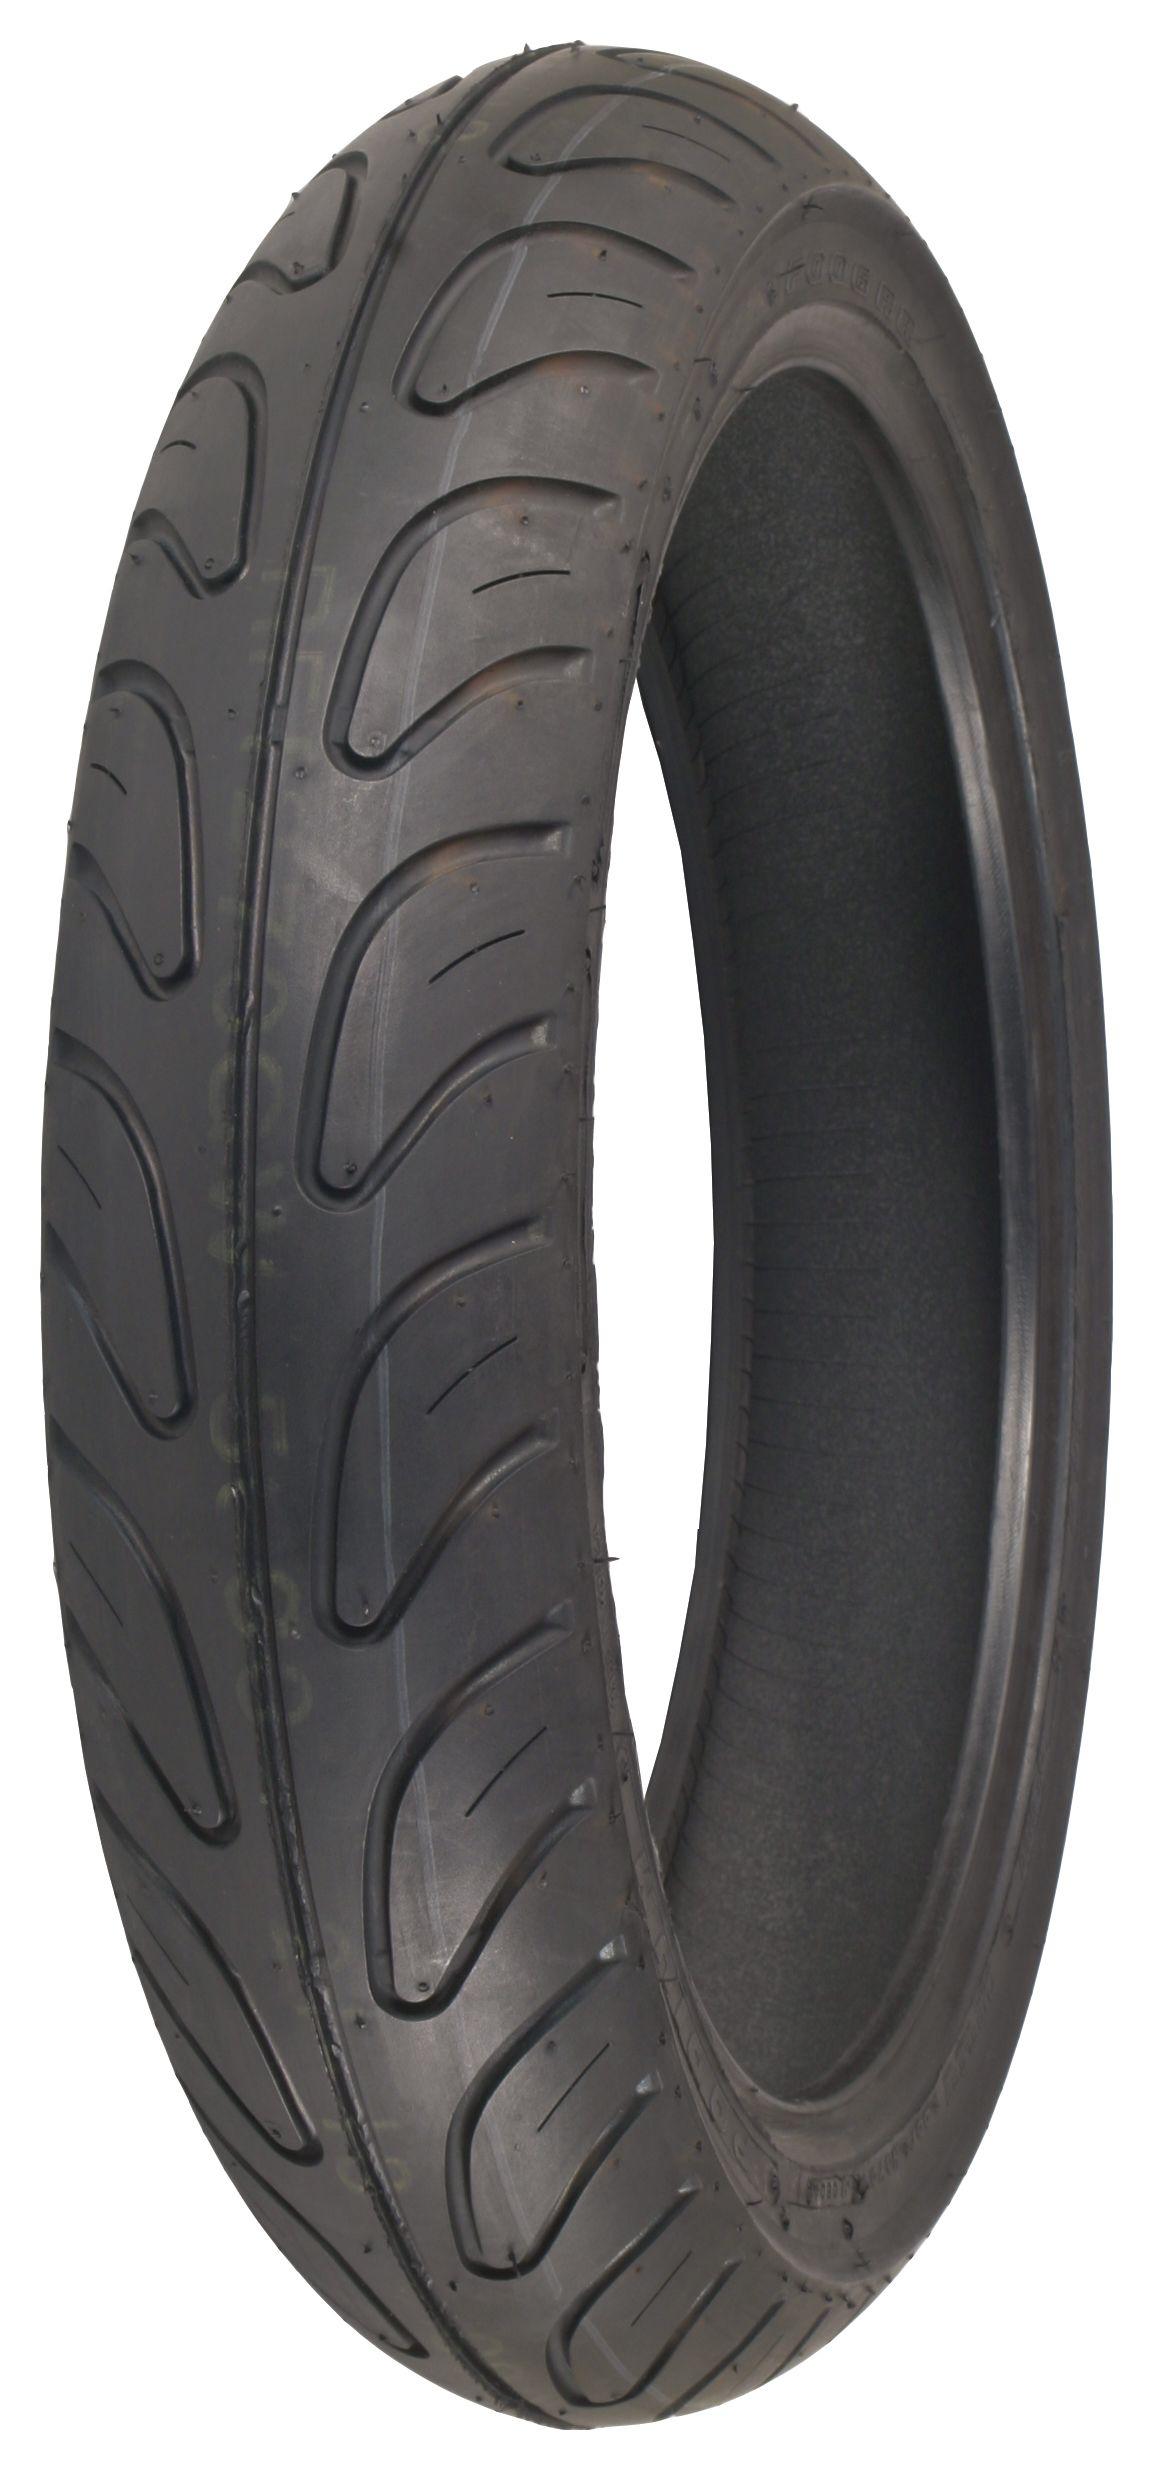 Shinko hook up drag radial rear tire